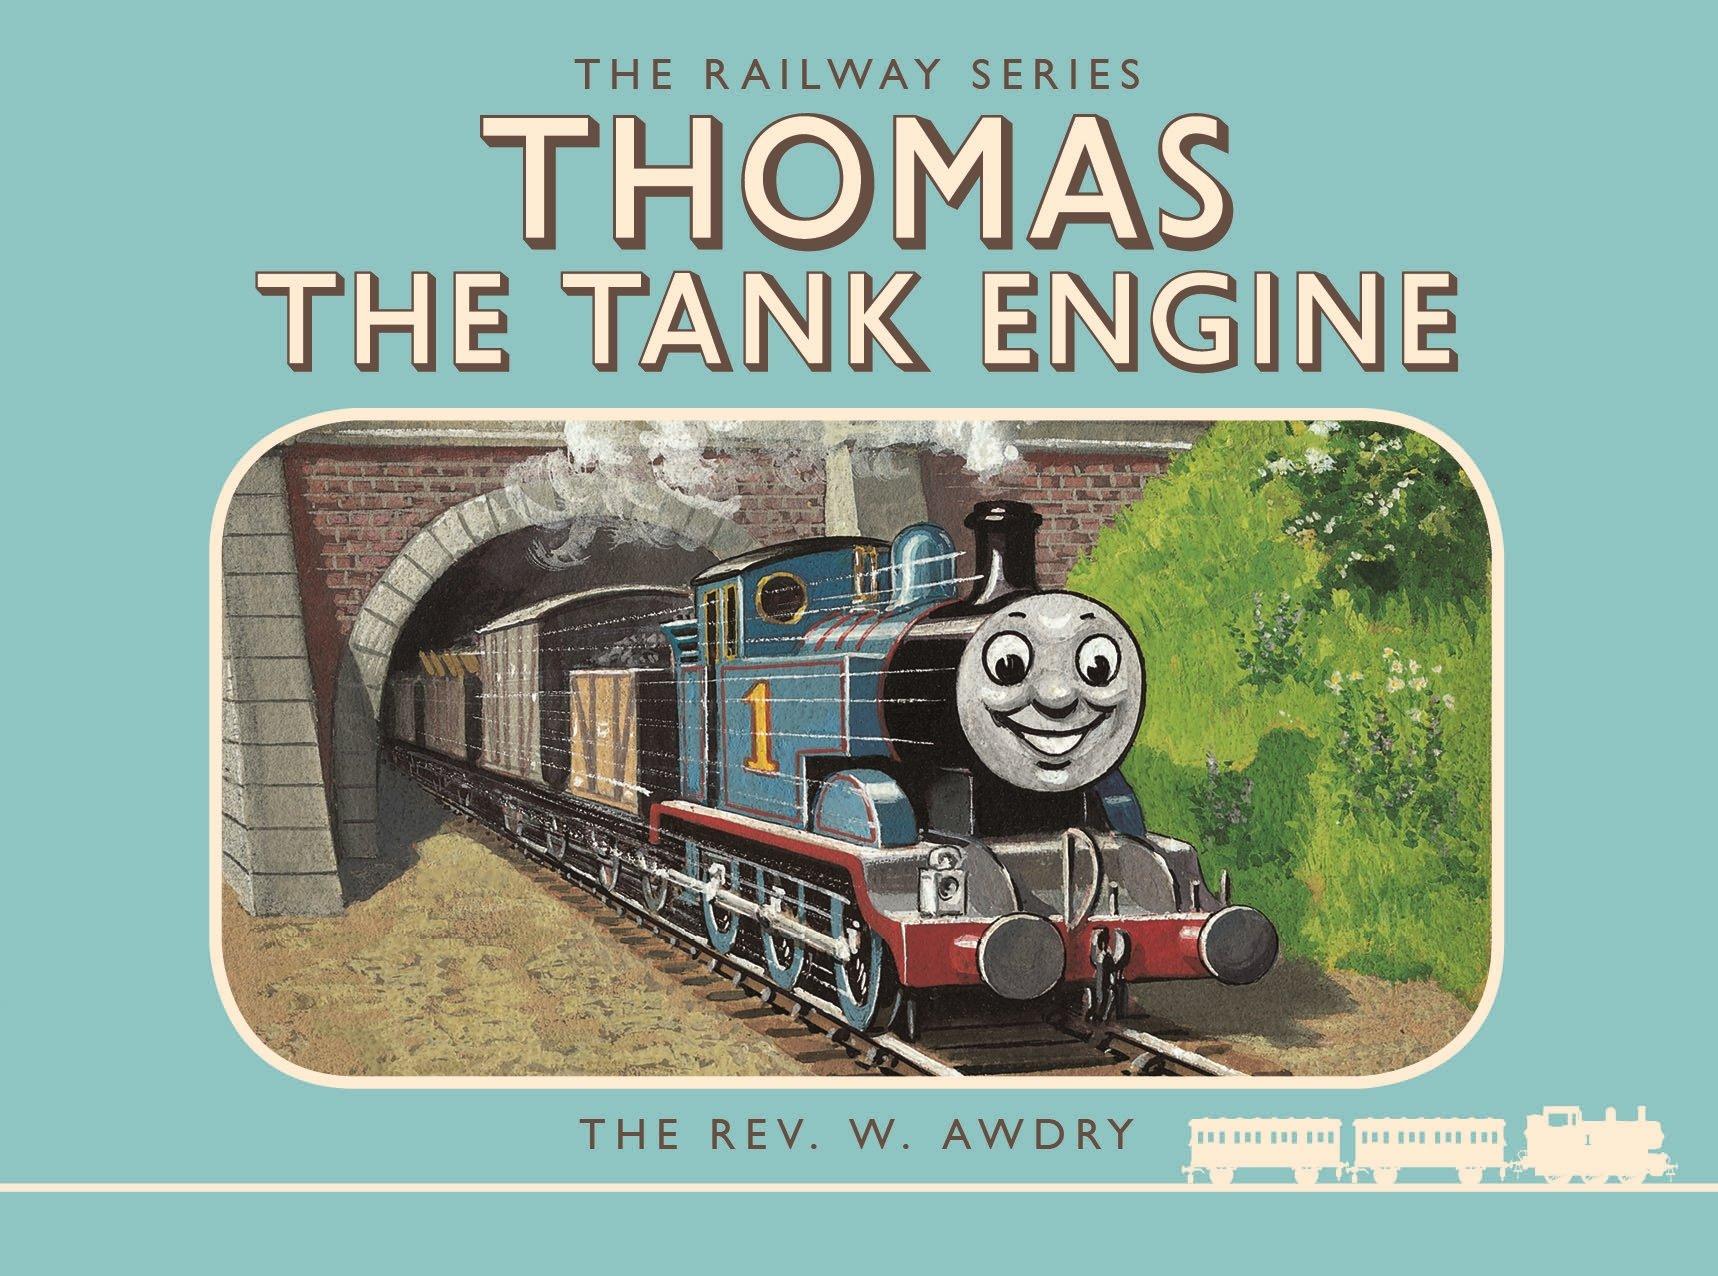 Thomas the Tank Engine the Railway Series